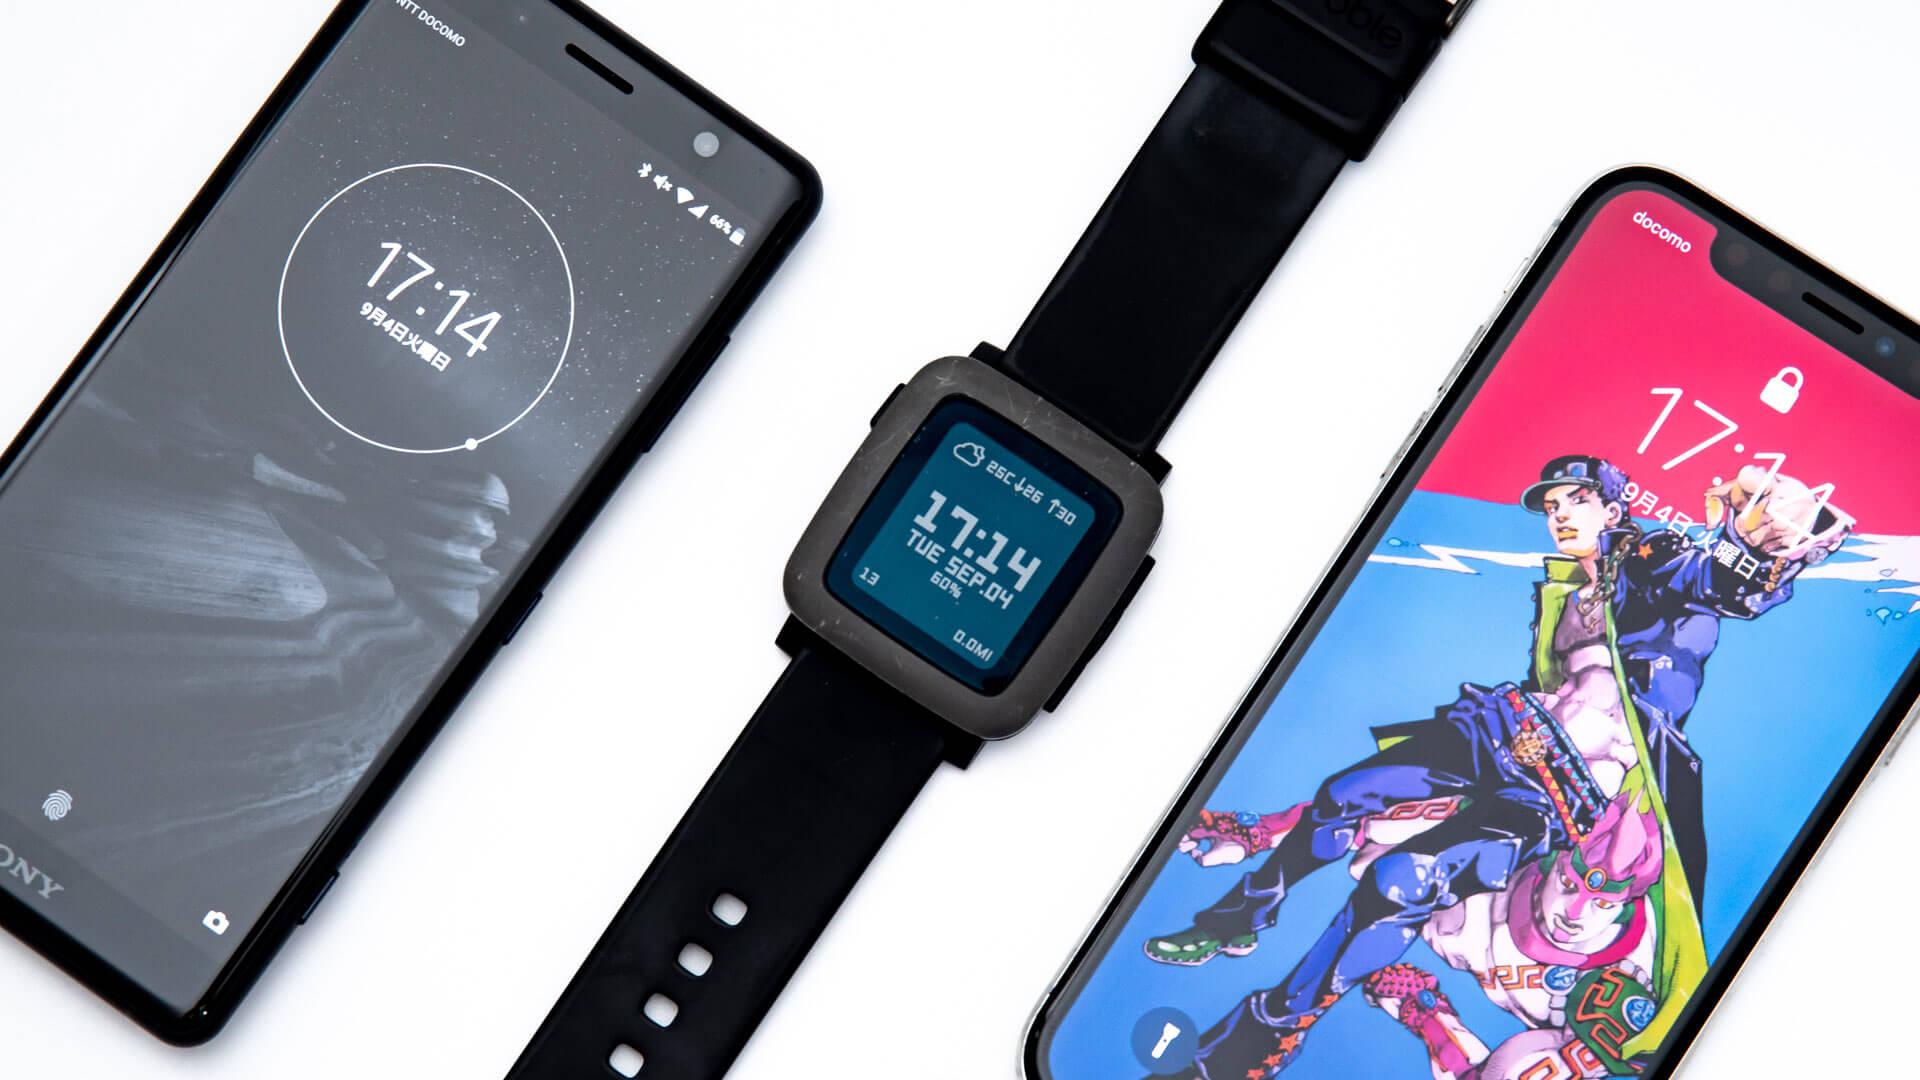 Pebble TimeでAndroidとiPhoneに同時に接続して通知を受ける方法